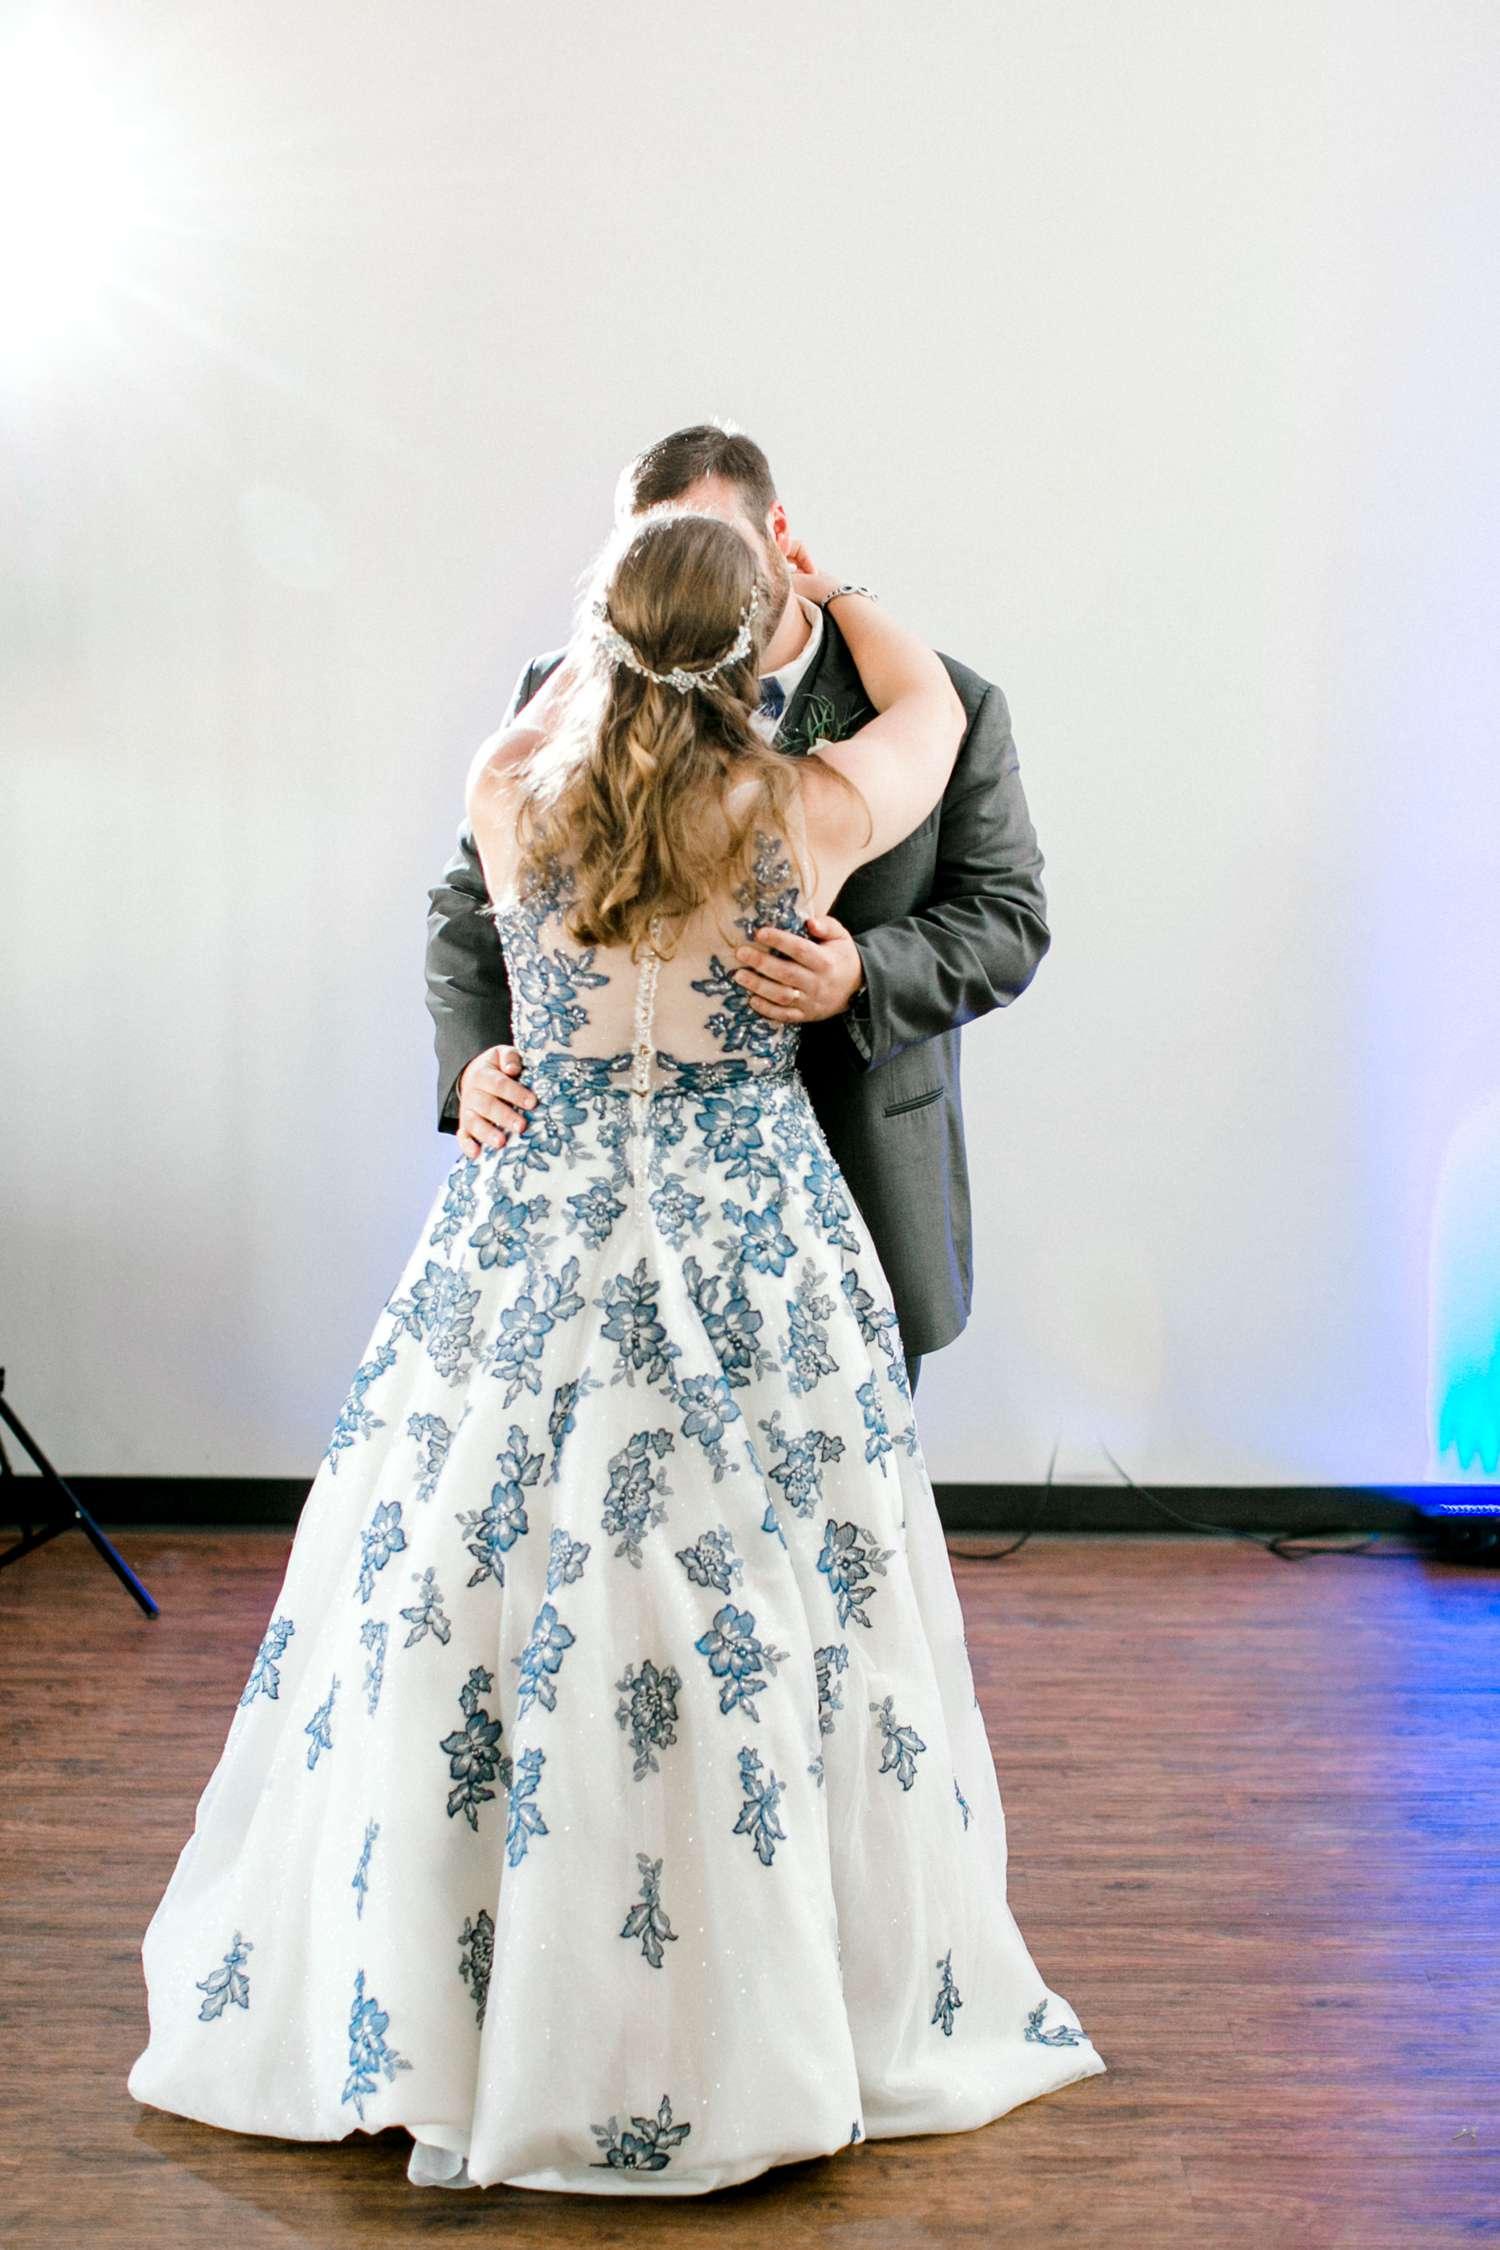 TY+NATHAN+HALLIER+ALLEEJ+WEDDING+PHOTOGRAPHER+RANSOM+CANYON_0104.jpg